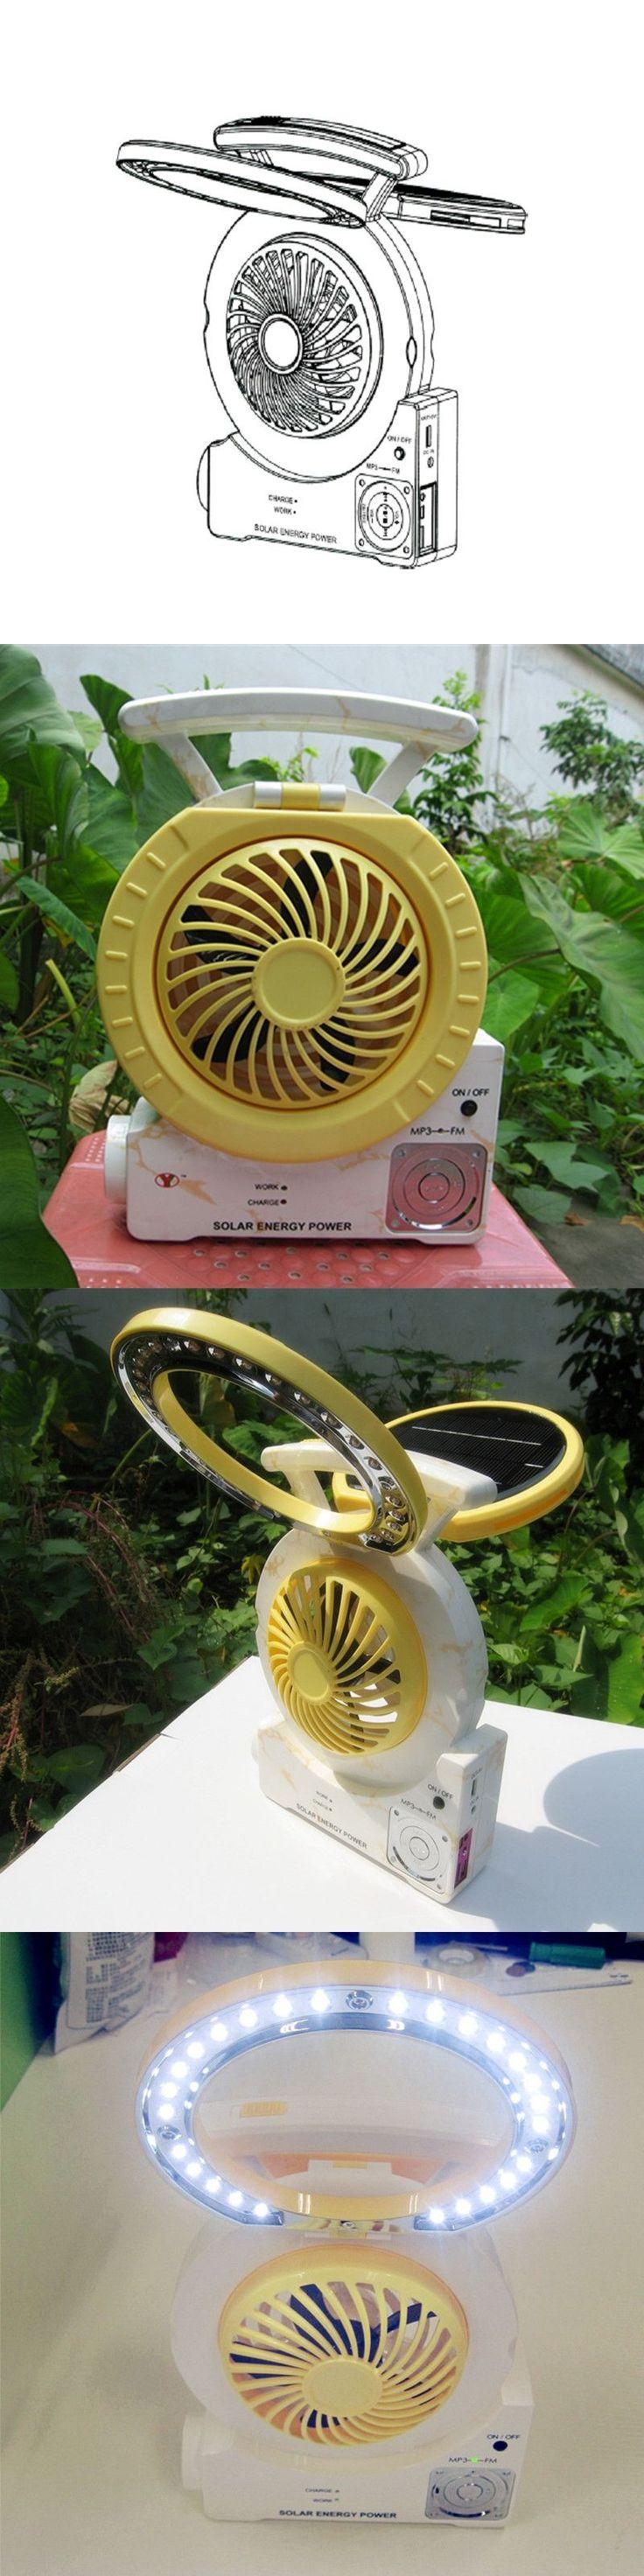 Multi-function Portable Solar Light Fan  26LEDs solar led audio lighting desk fan lamp with flash spotlight for Camping Fishing